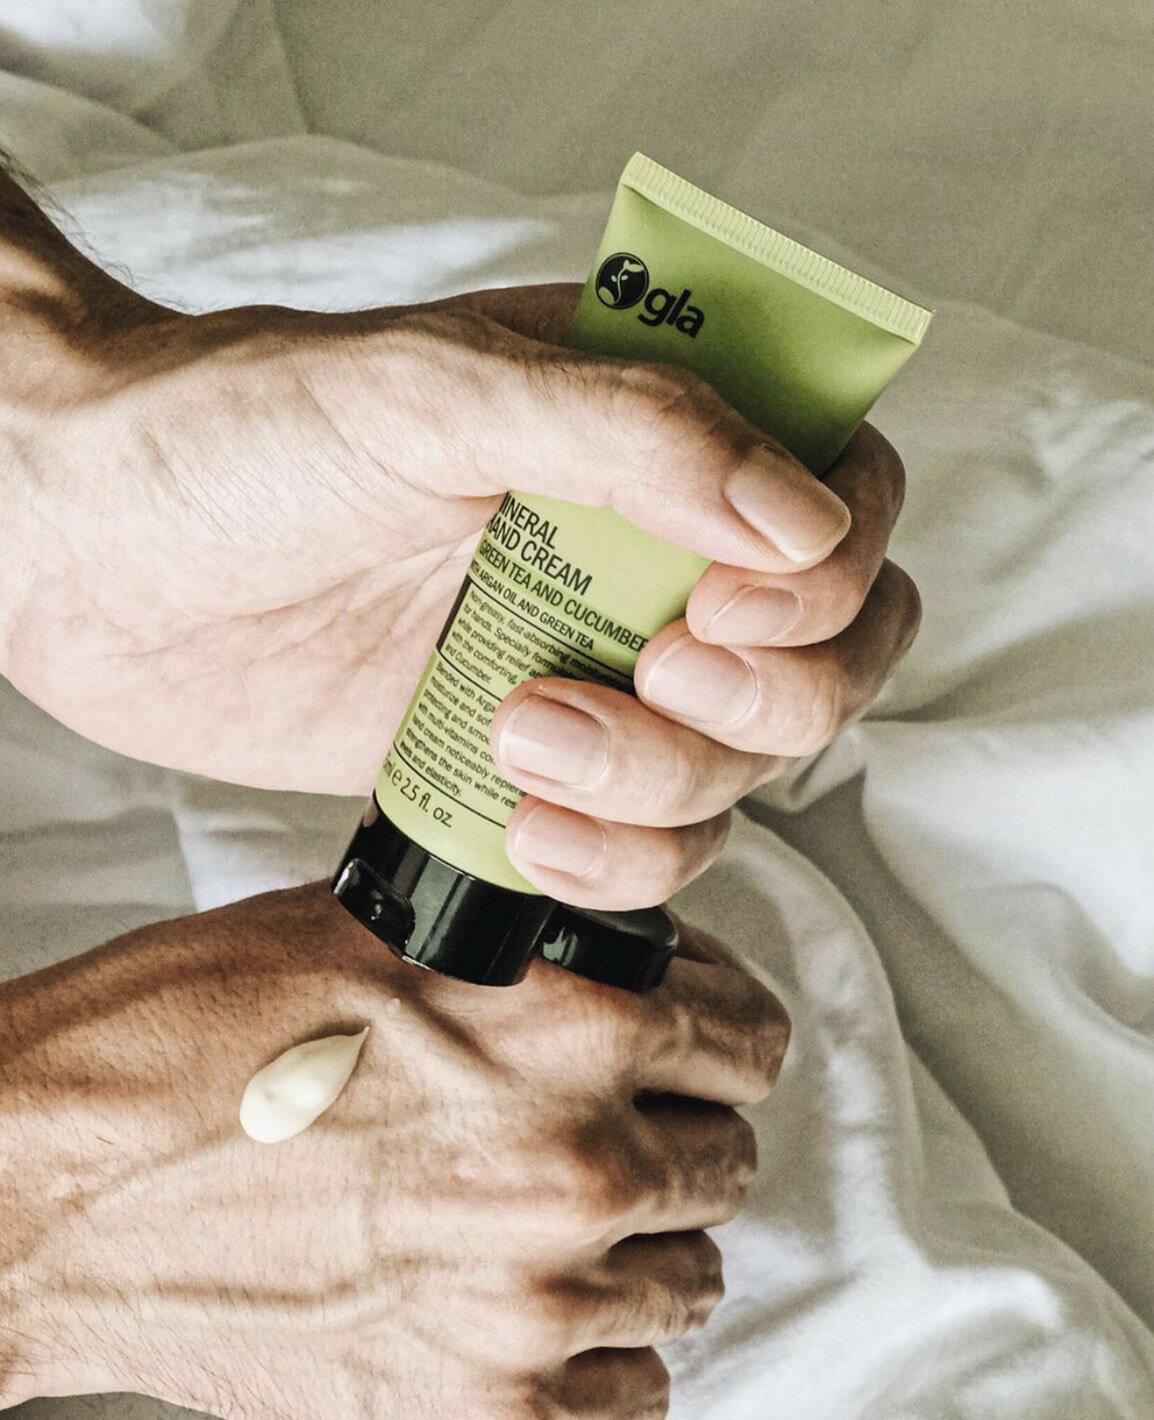 gla skincare 綠茶與小黃瓜礦物護手霜 〔渼妍國際〕 1